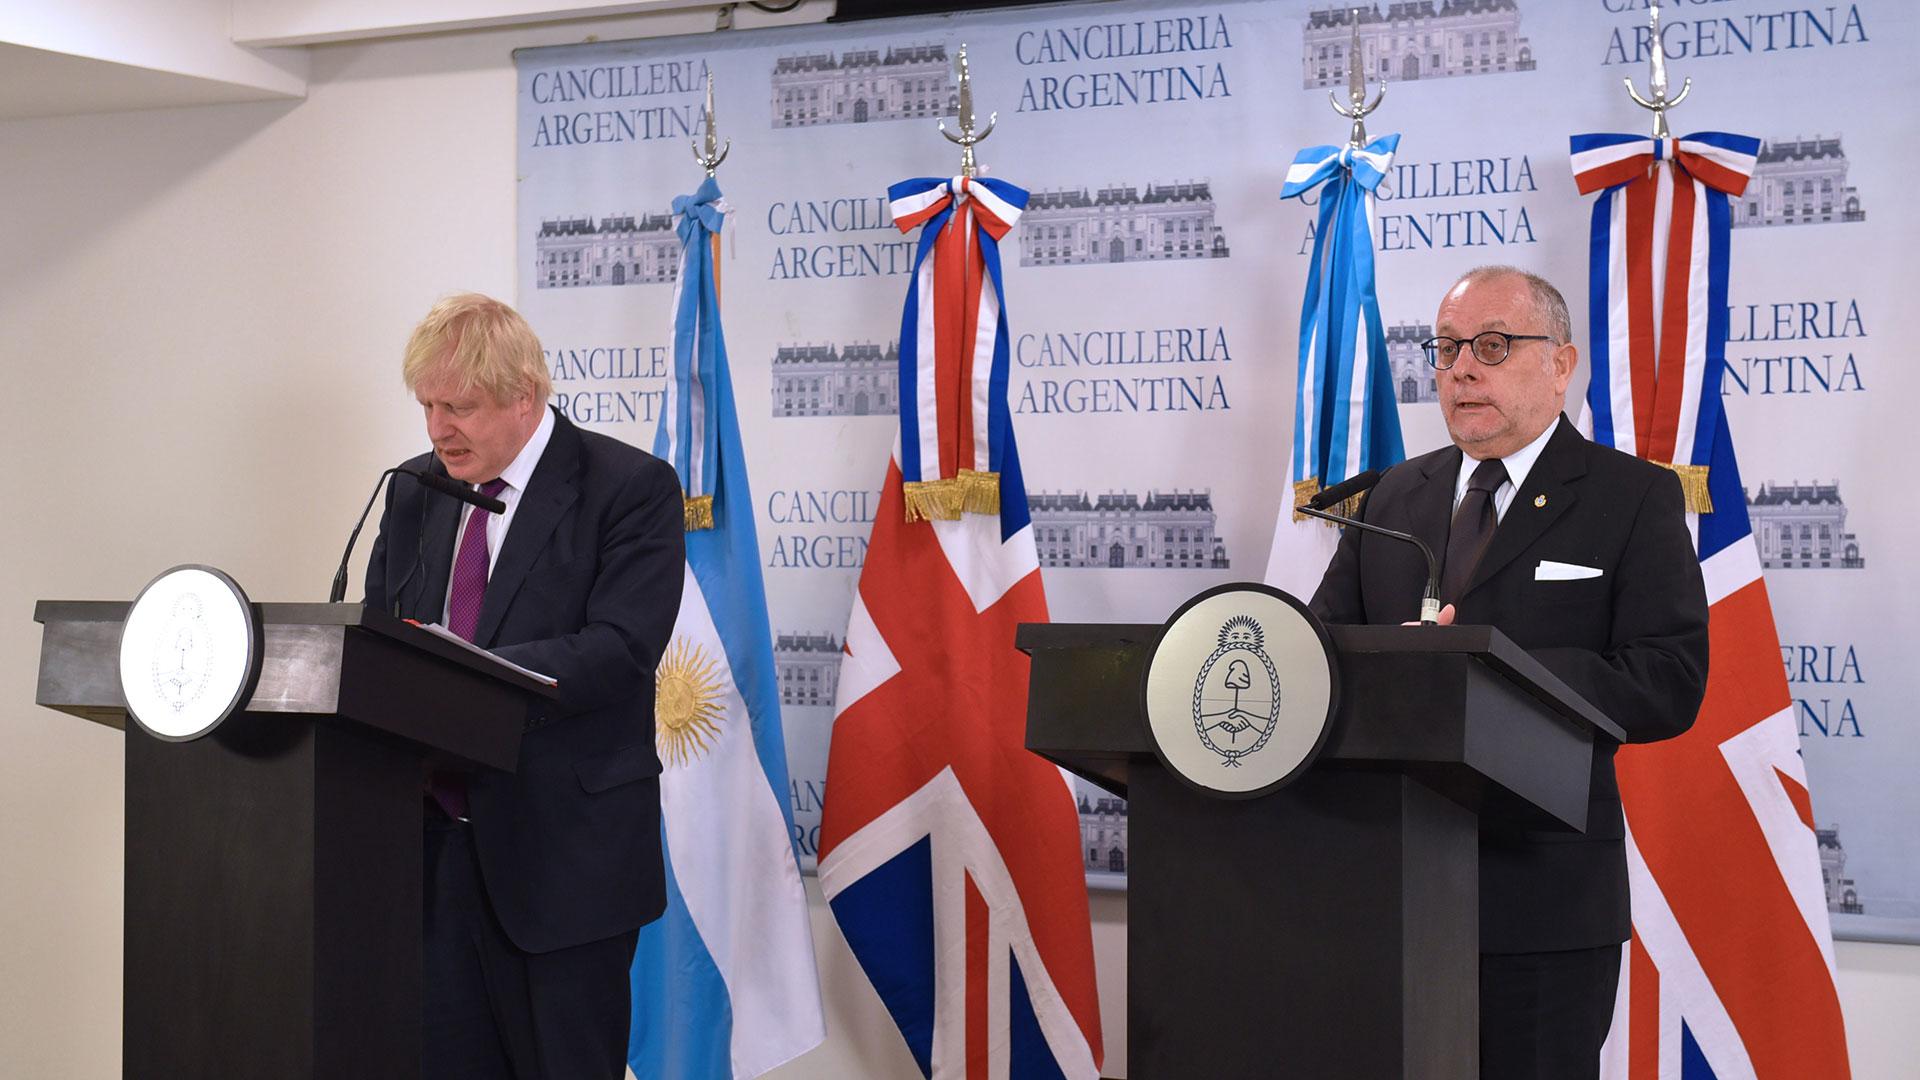 El canciller inglés Boris Johnson junto a su par argentino Jorge Faurie (Télam)